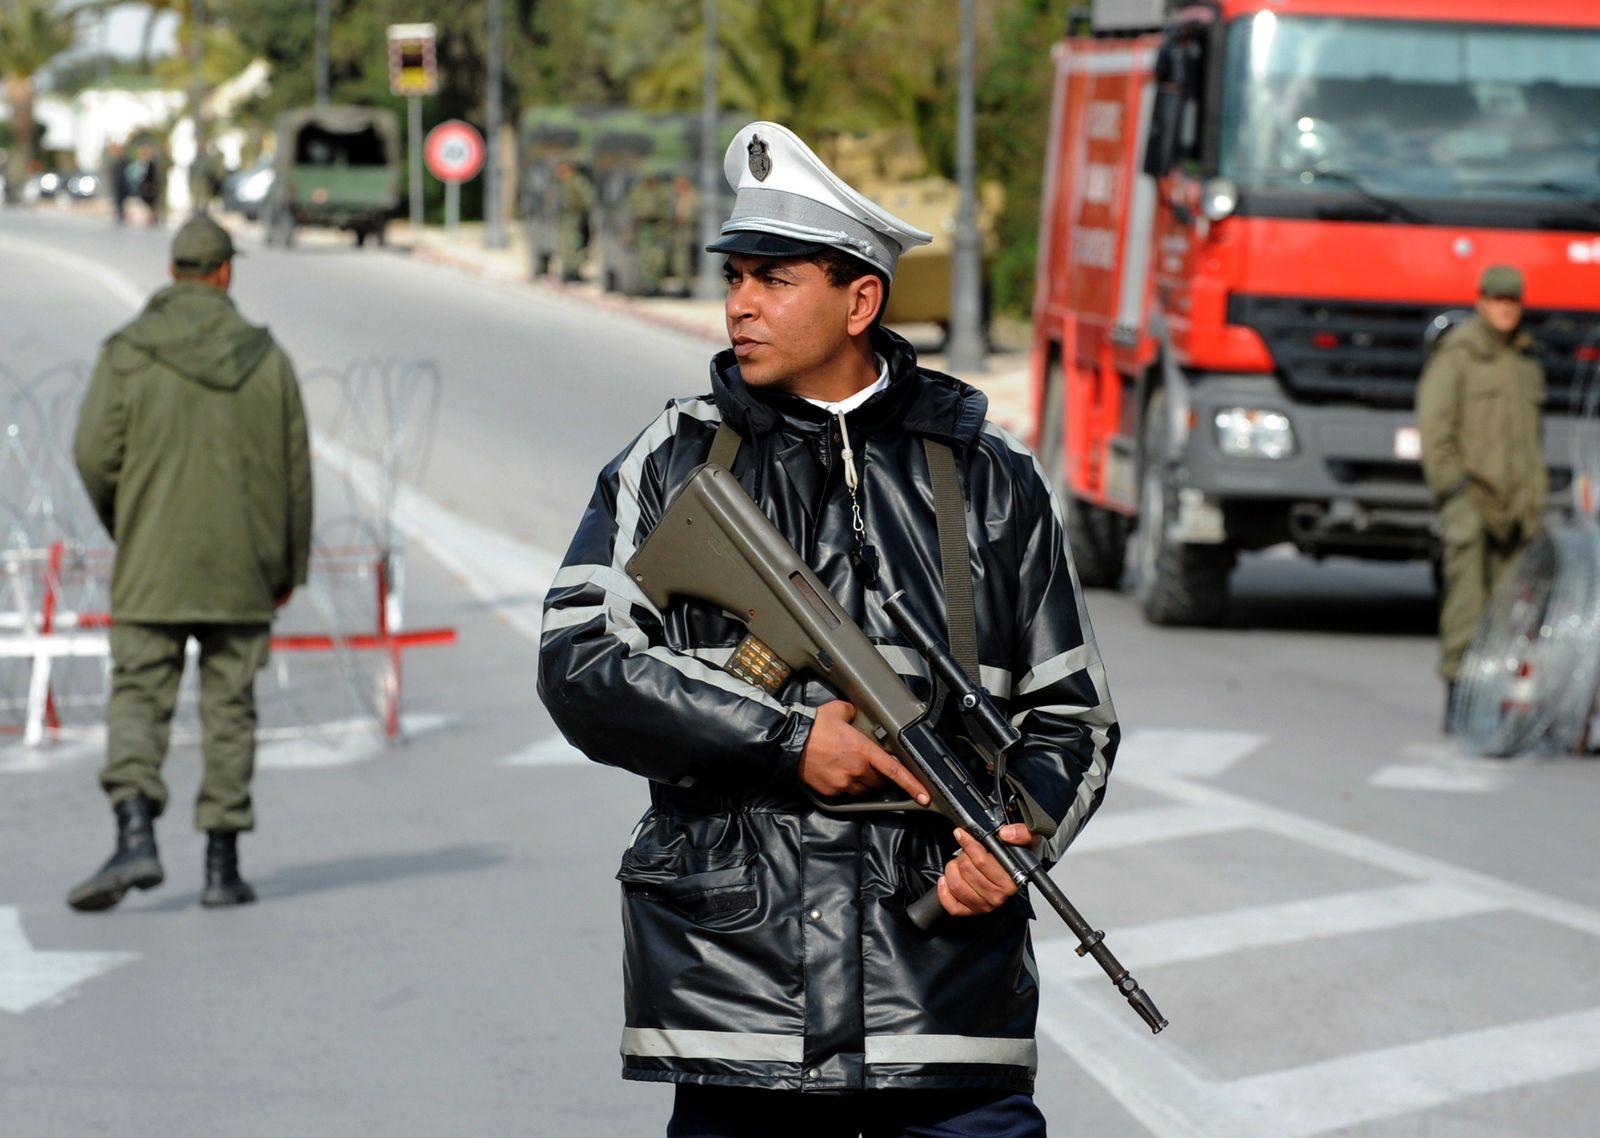 Tunesien Proteste Samstag